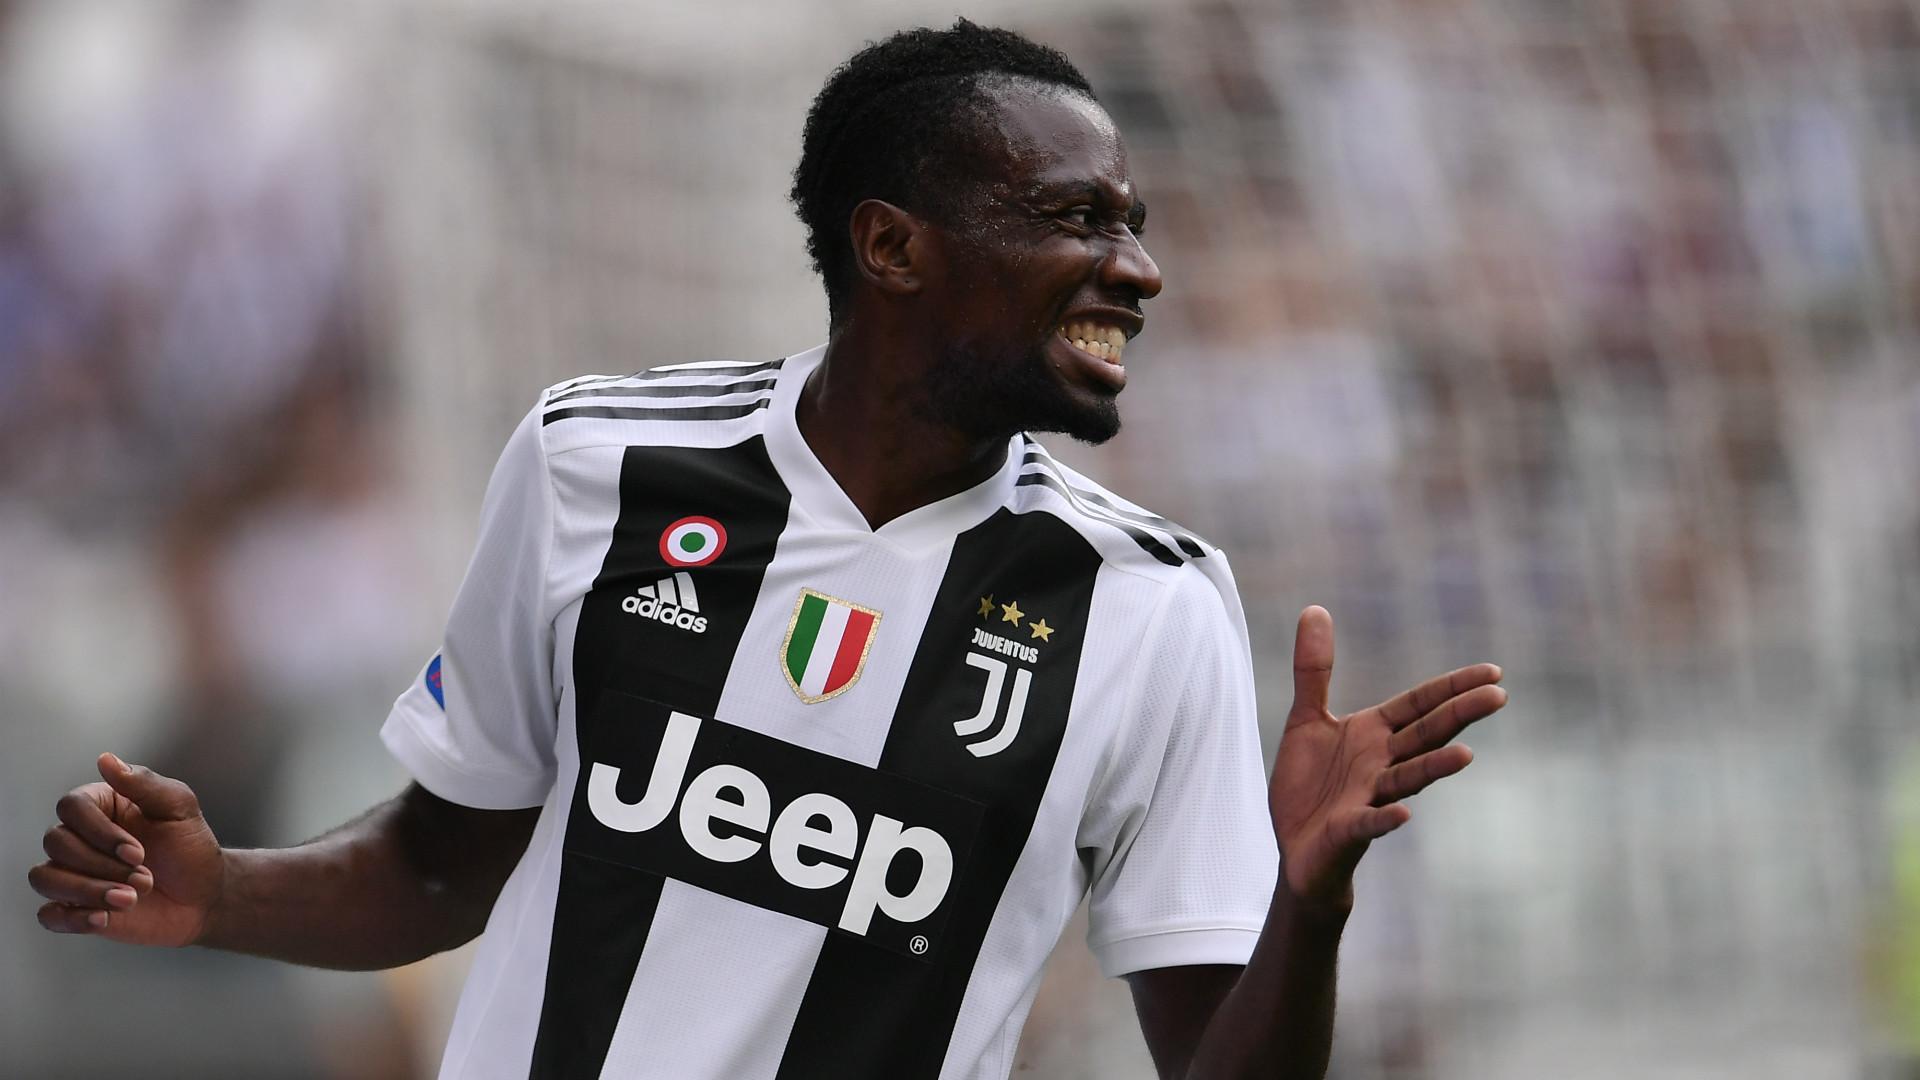 Mercato Juventus, Matuidi peut s'en aller : contacts avec Monaco